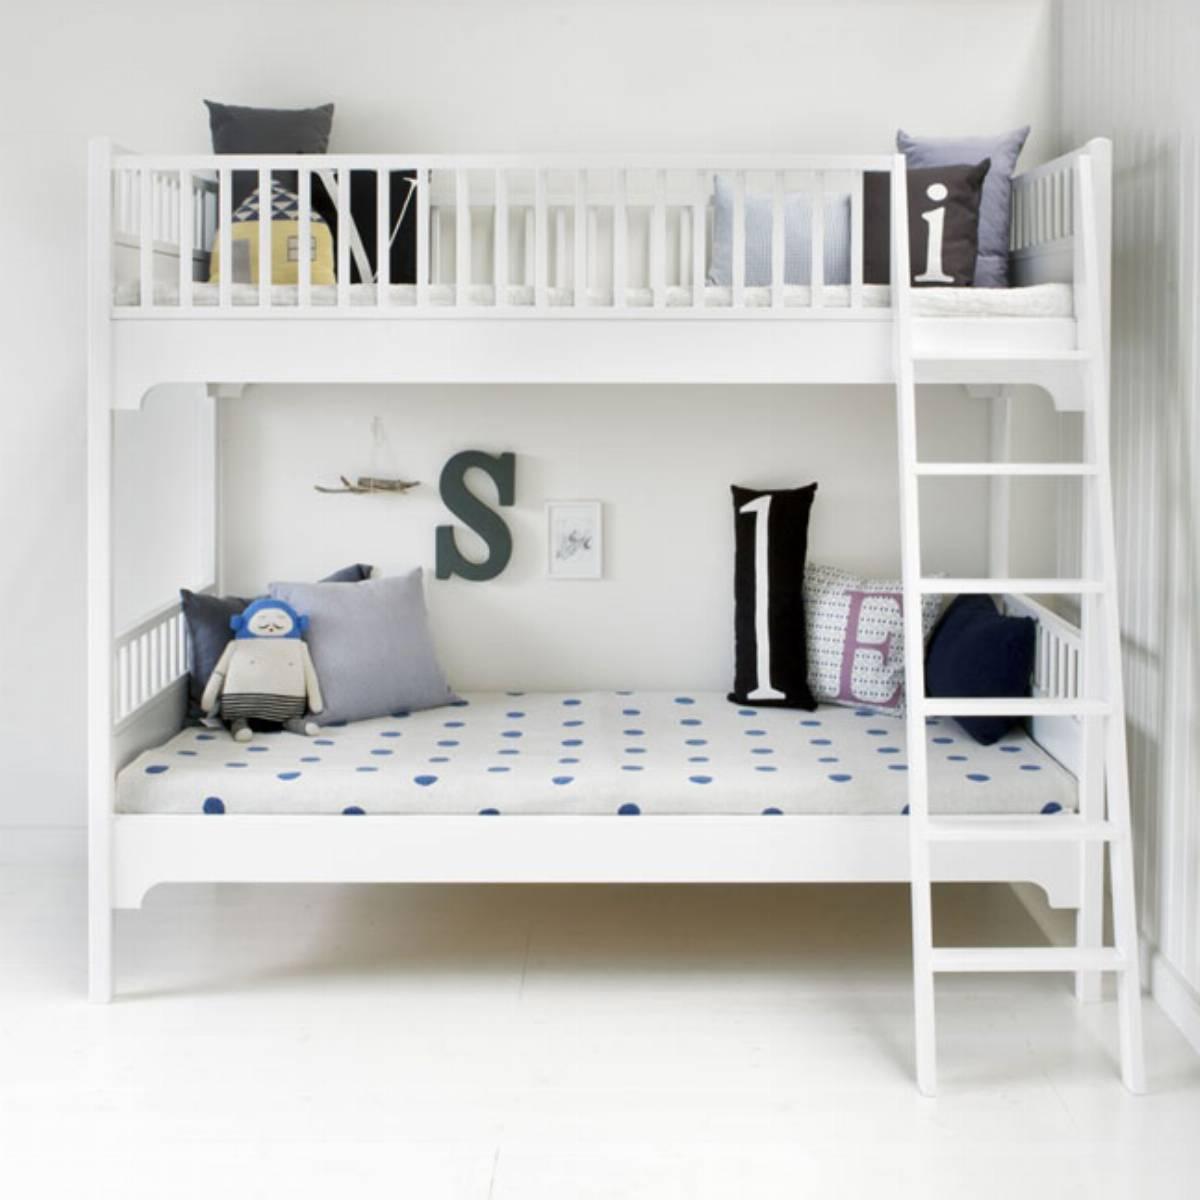 Pokoj dla dziecka - Scandinavian Living (6)